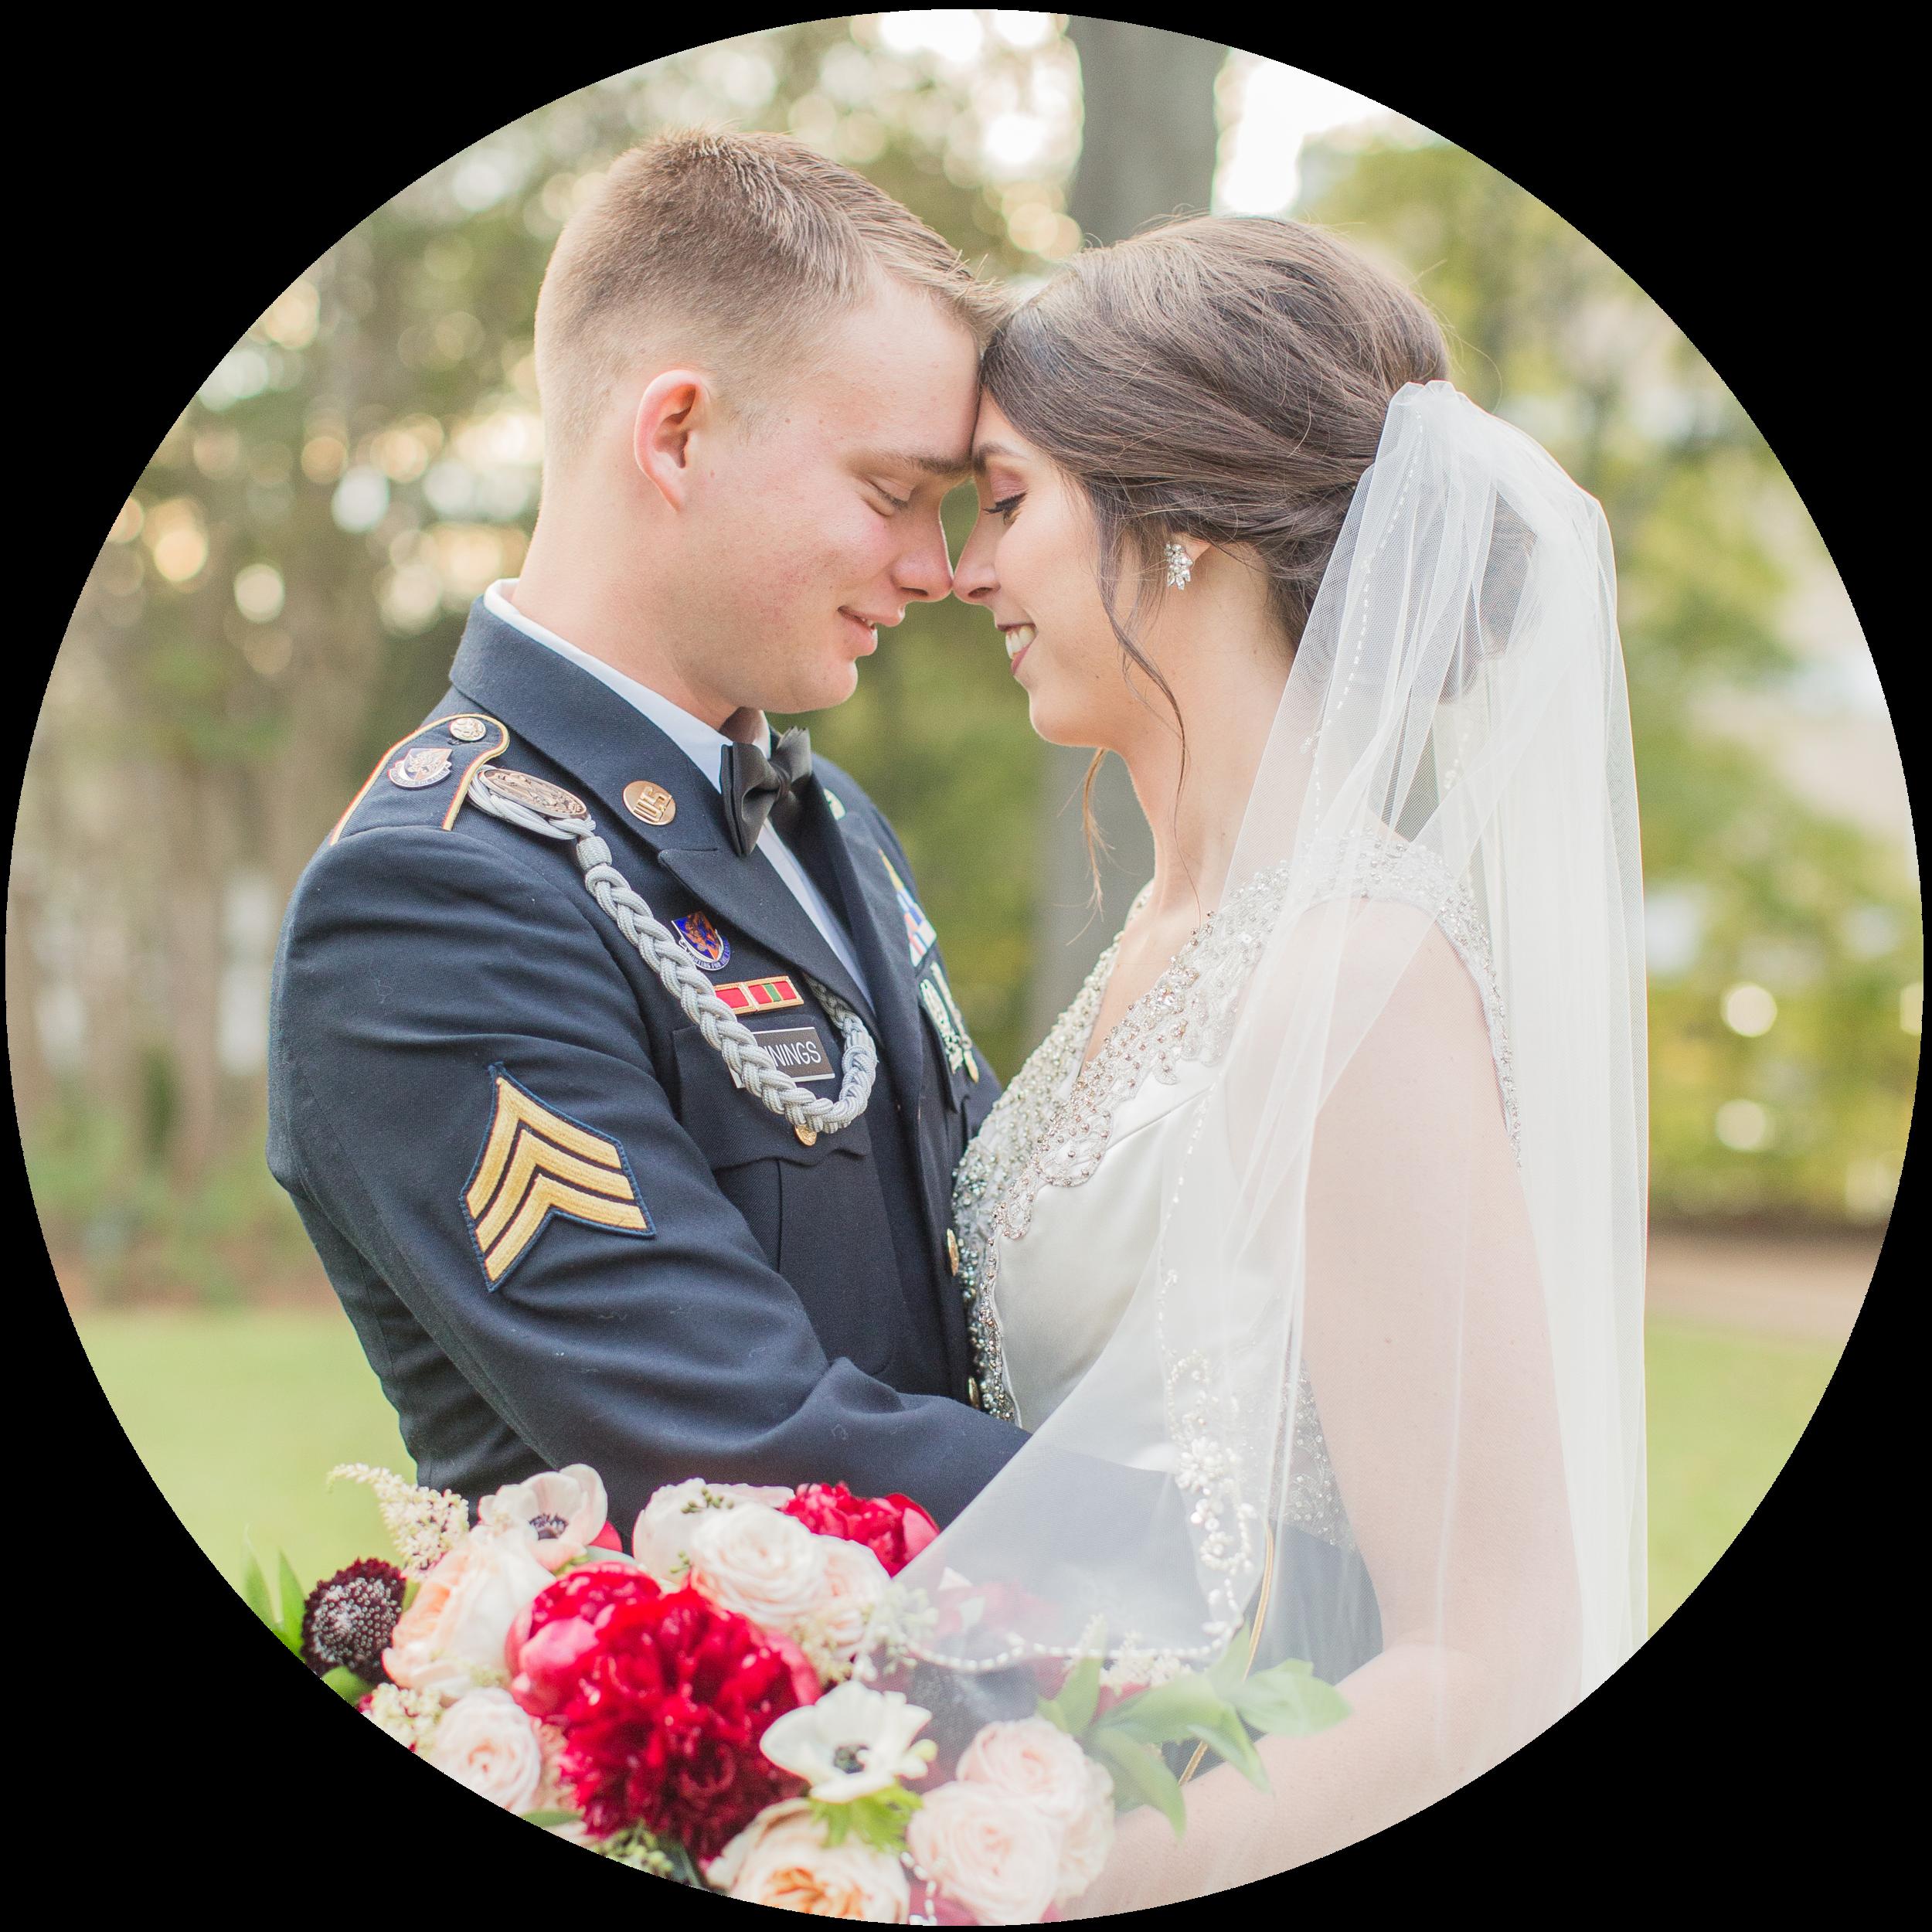 mississippi-wedding-photographer-6.png